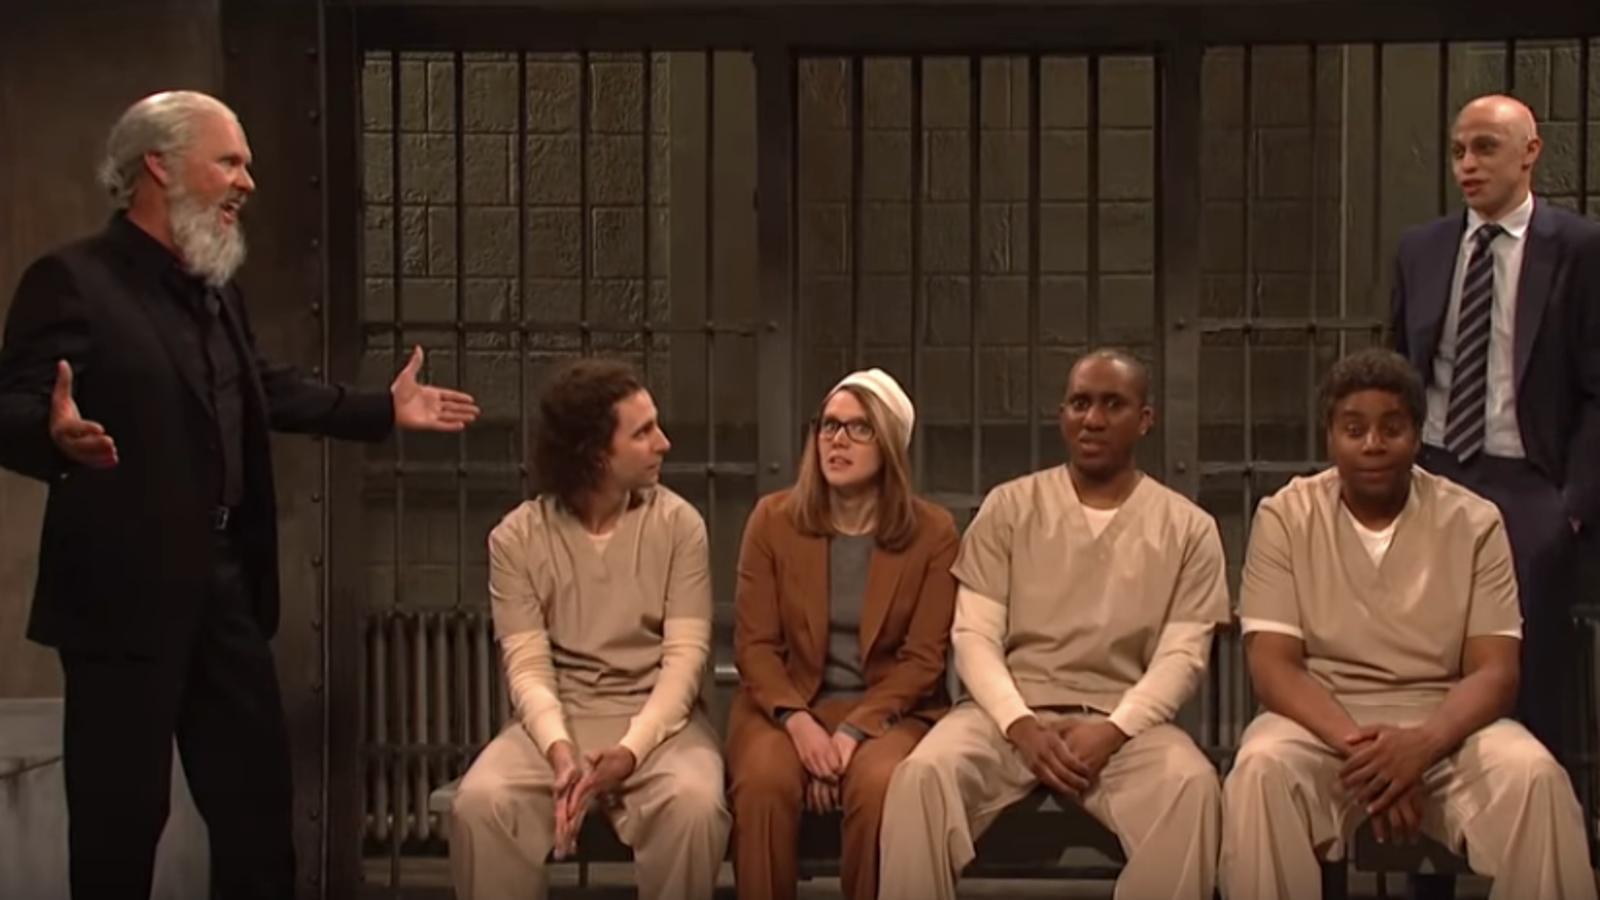 Michael Keaton drops by as Julian Assange to assist SNL roast the most recent celeb jailbirds - The A.V. Club thumbnail